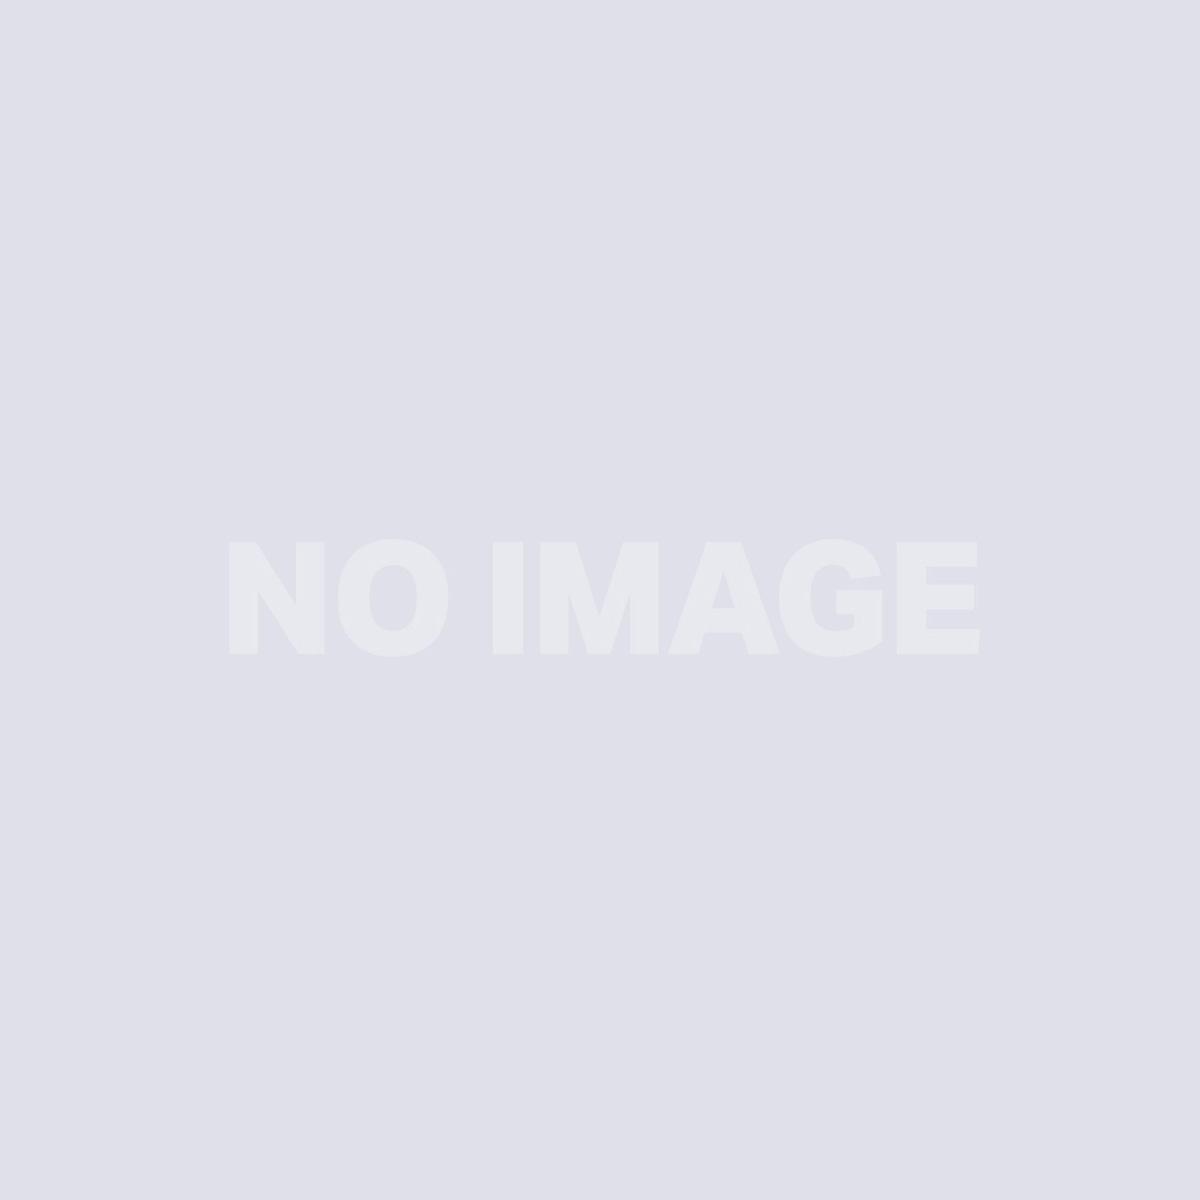 100/32 Nylon Swivel Castor with Ball Bearings